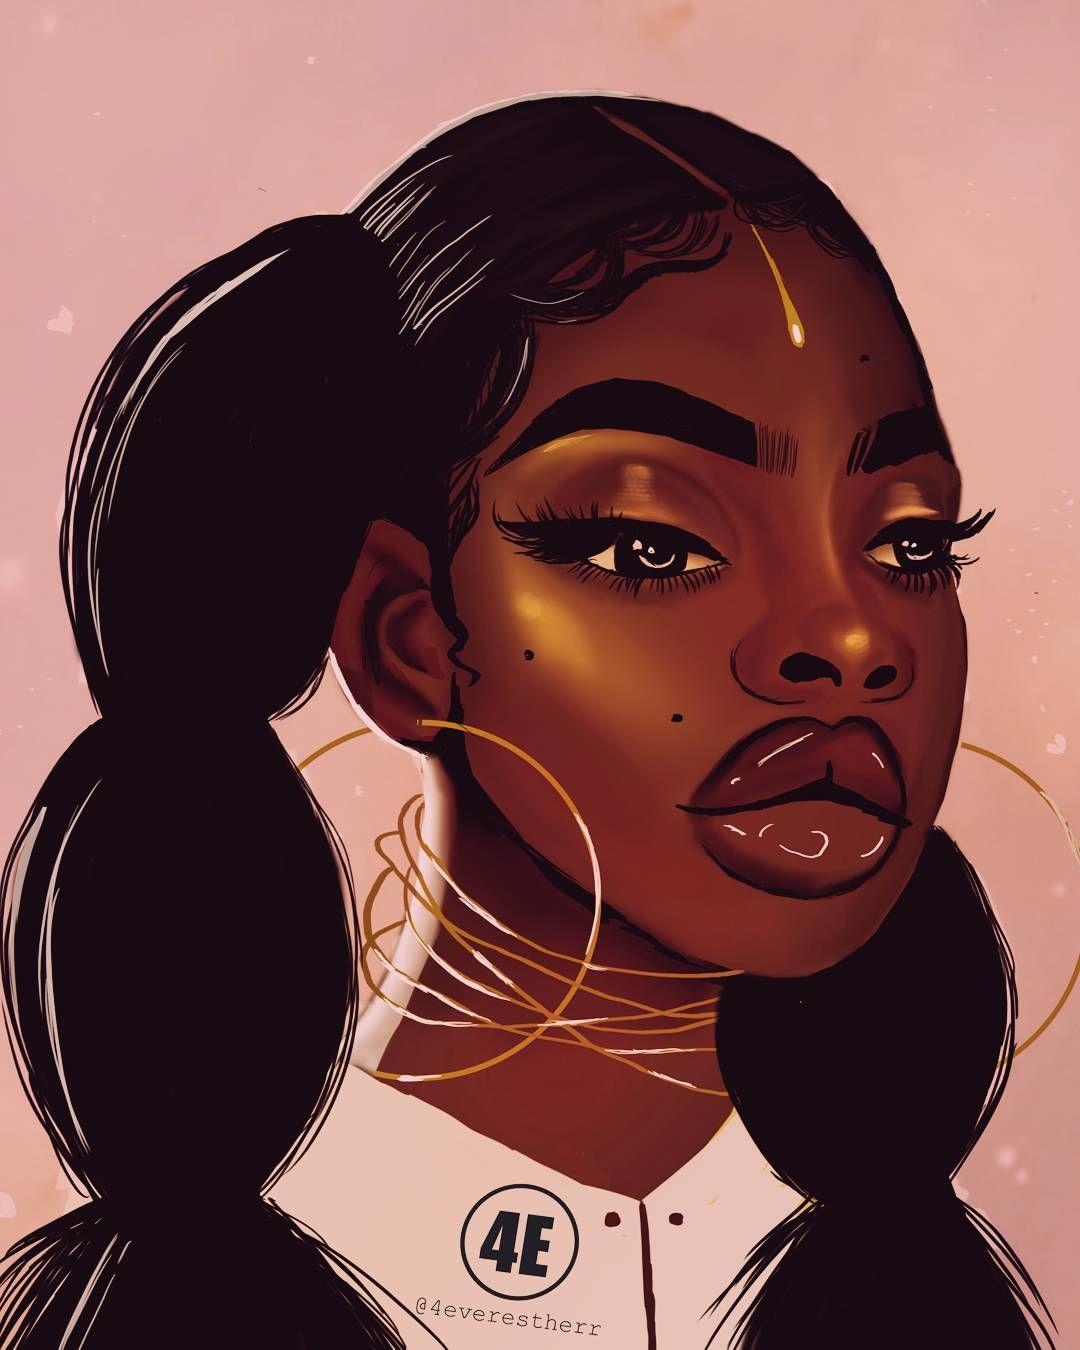 Pin Dee Bx Blackhistory In 2019 Art Black Girl